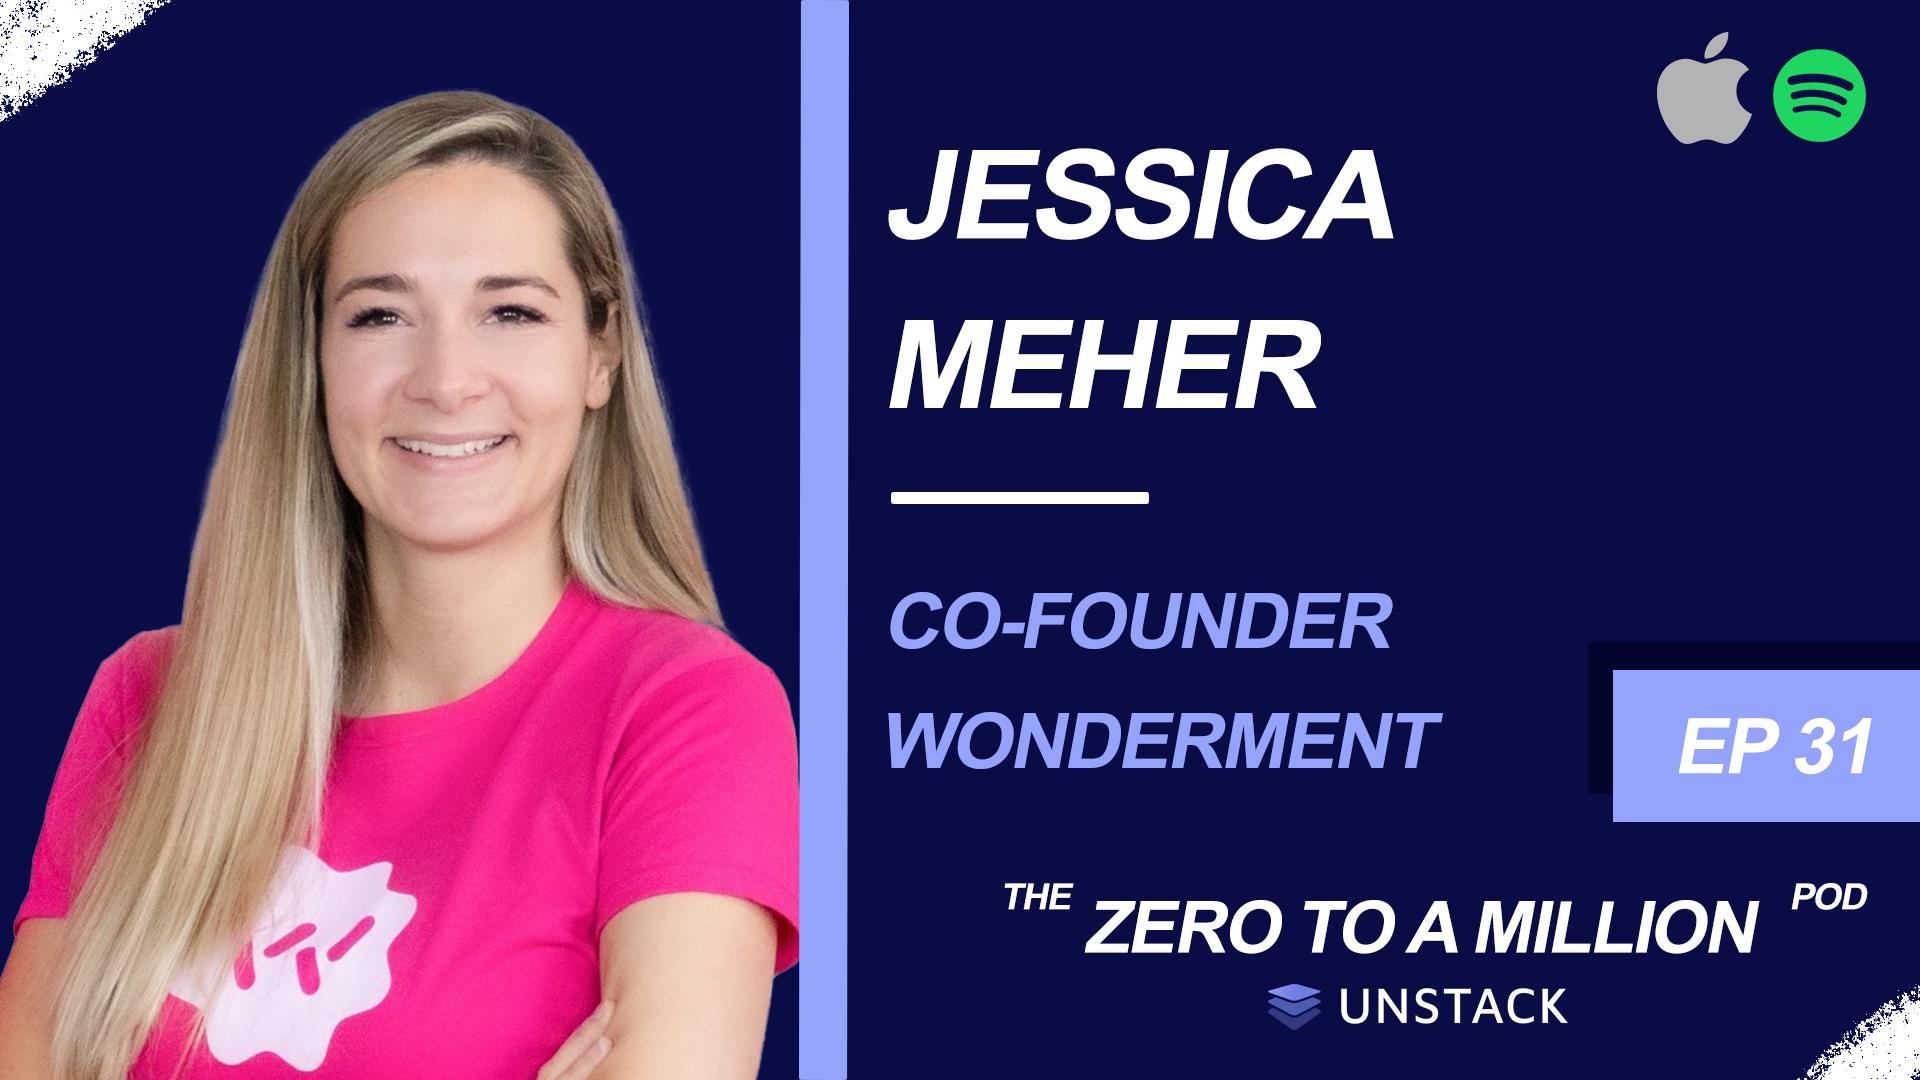 Zero to a Million, Episode 31: Jess Meher, Co-Founder, Wonderment